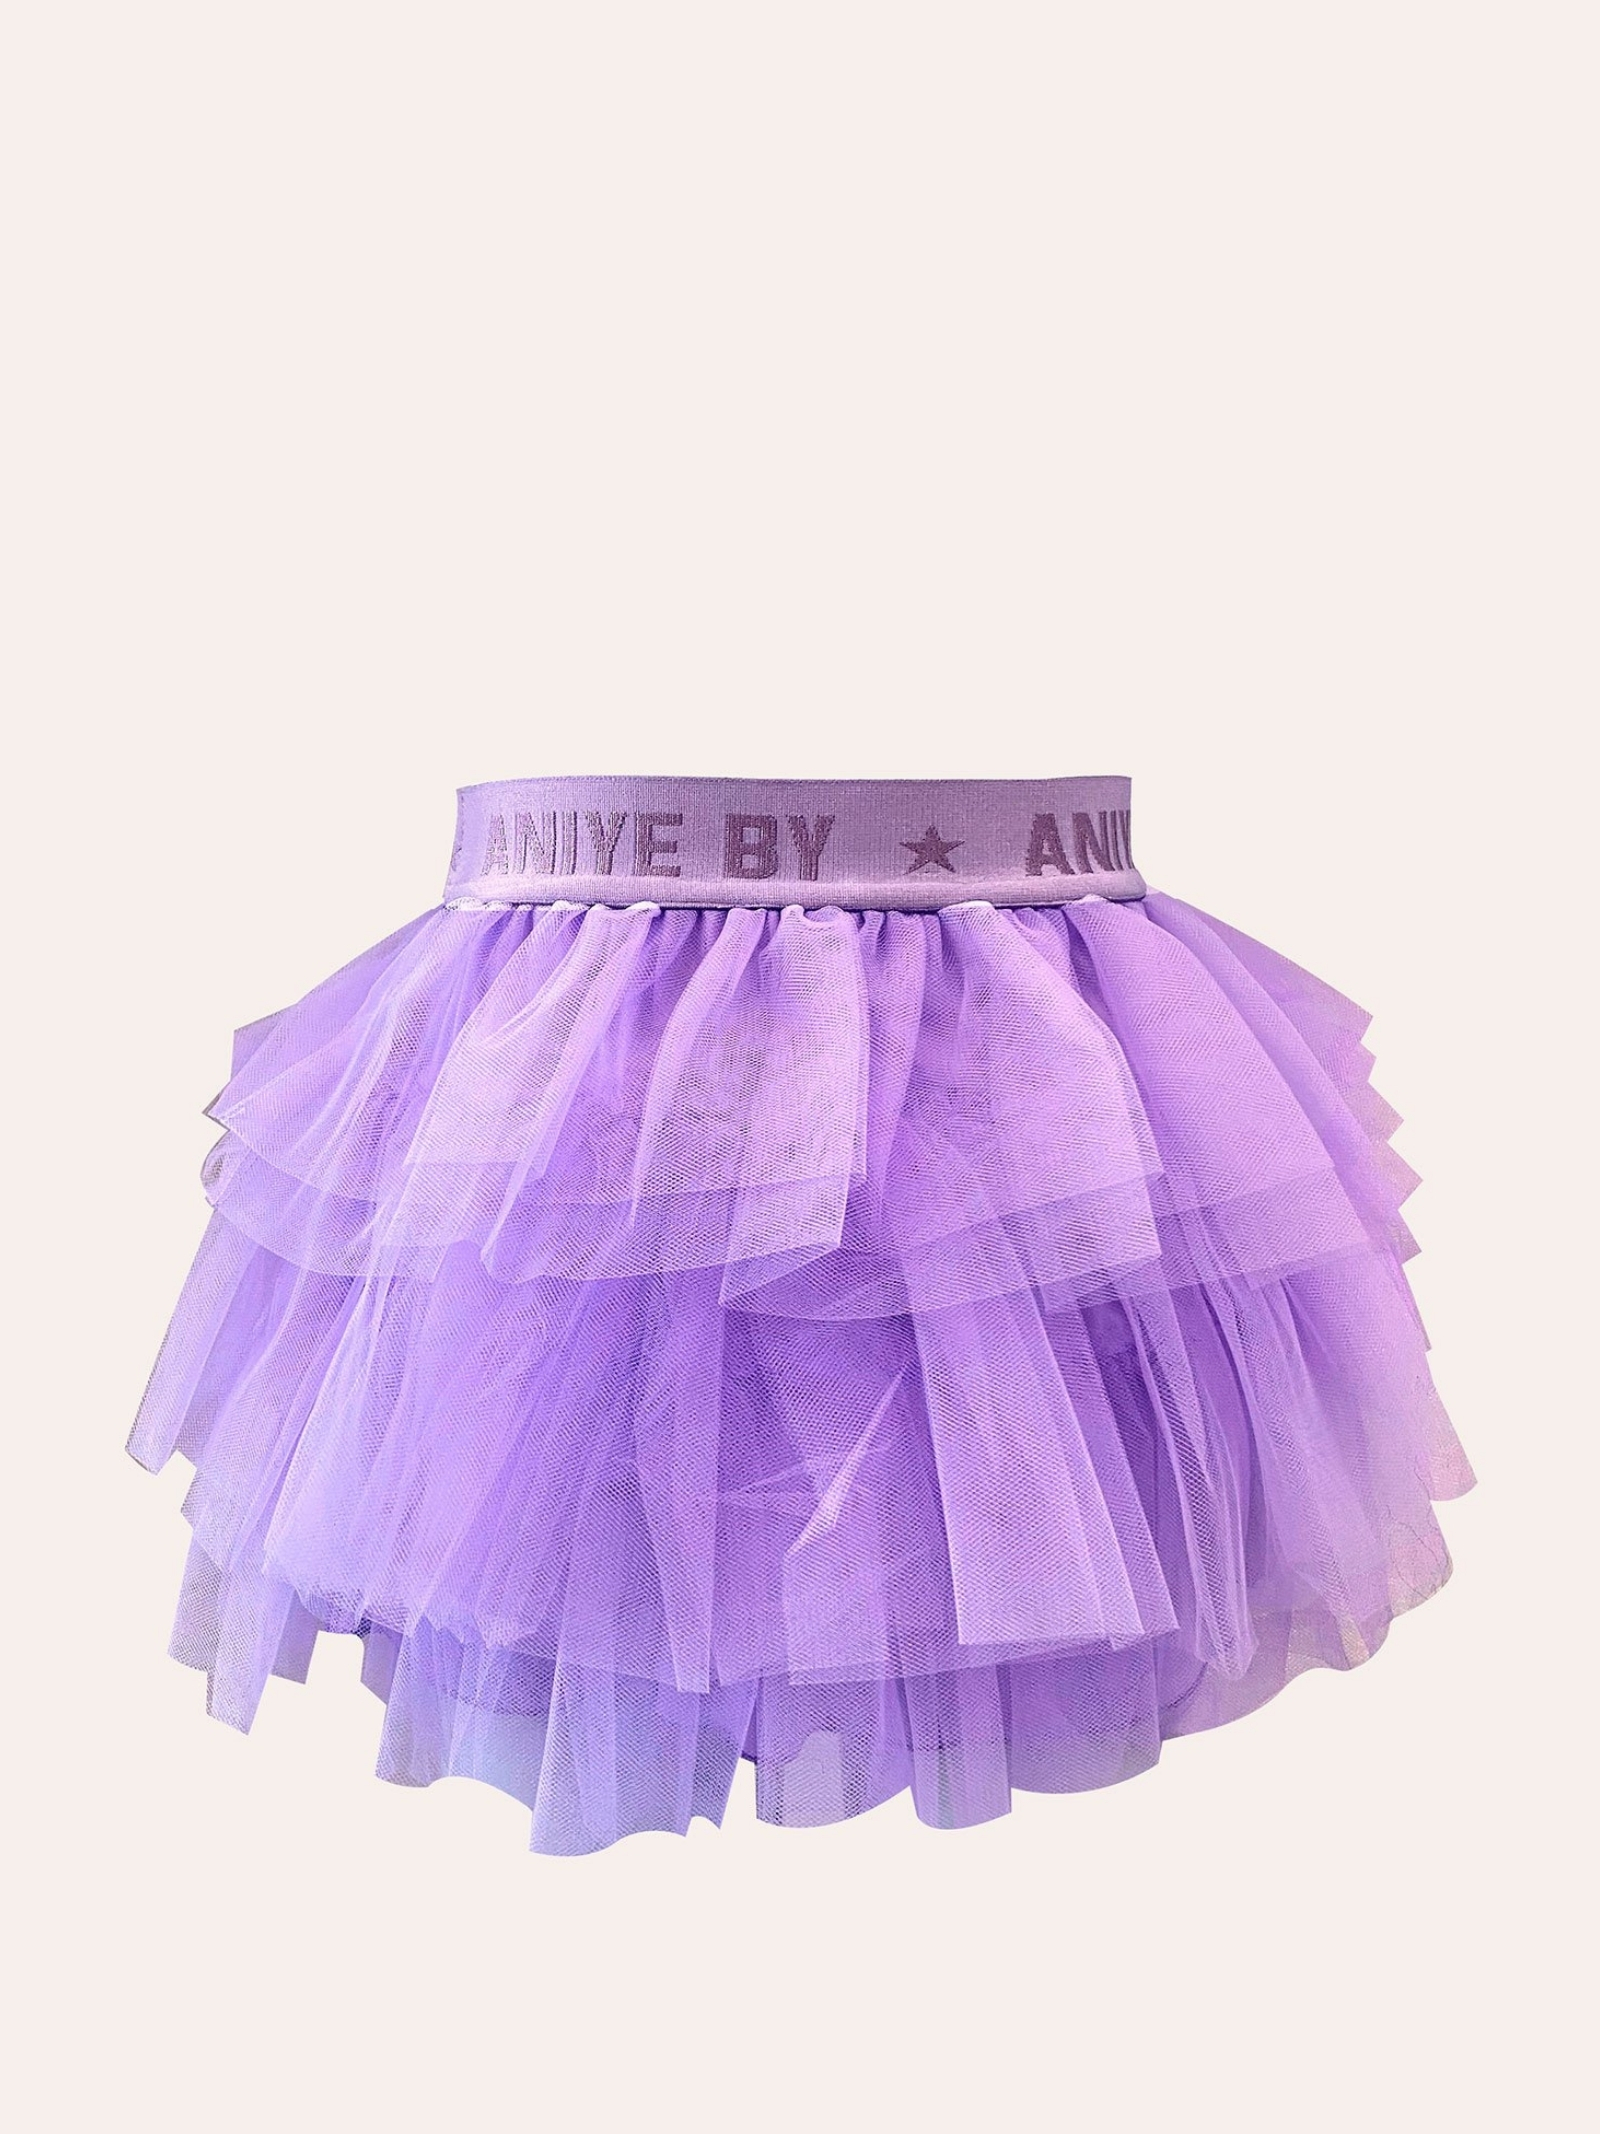 Tulle Skirt with Logo for Girls ANIYE BY GIRL | Skirts | 11125202034